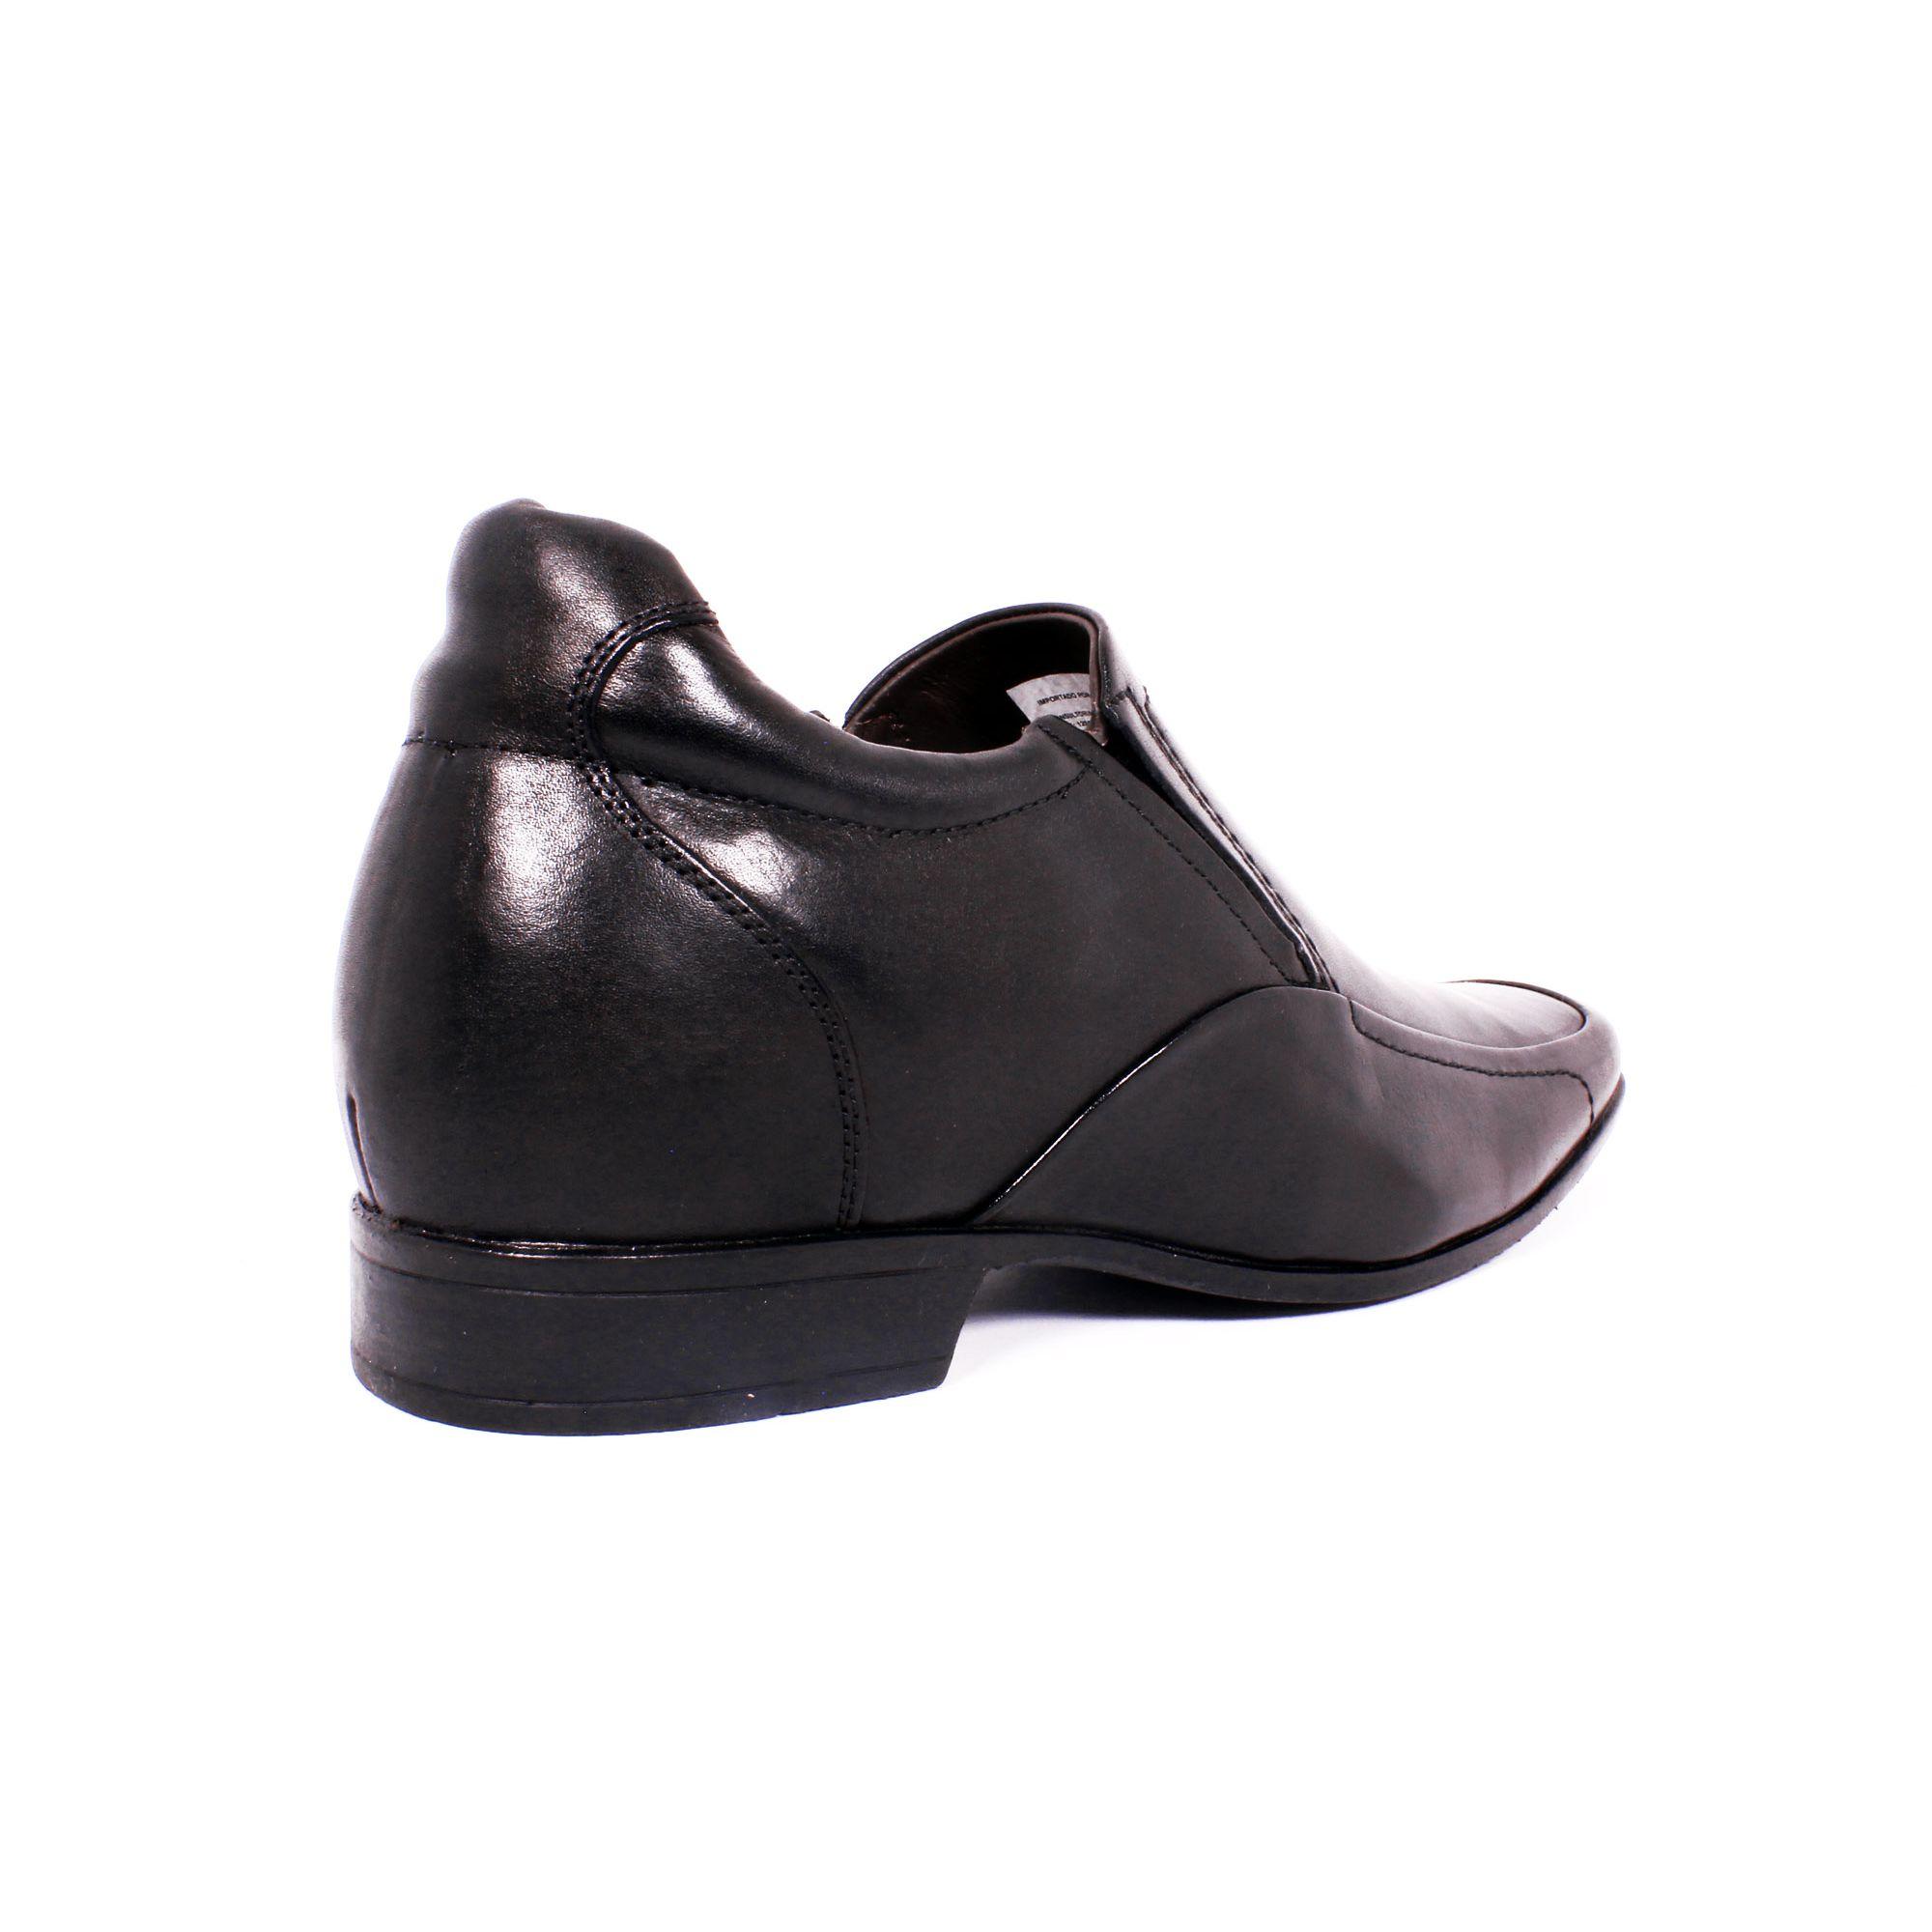 Zapato Formal Tabaco Negro Max Denegri +7cms de Altura_70843